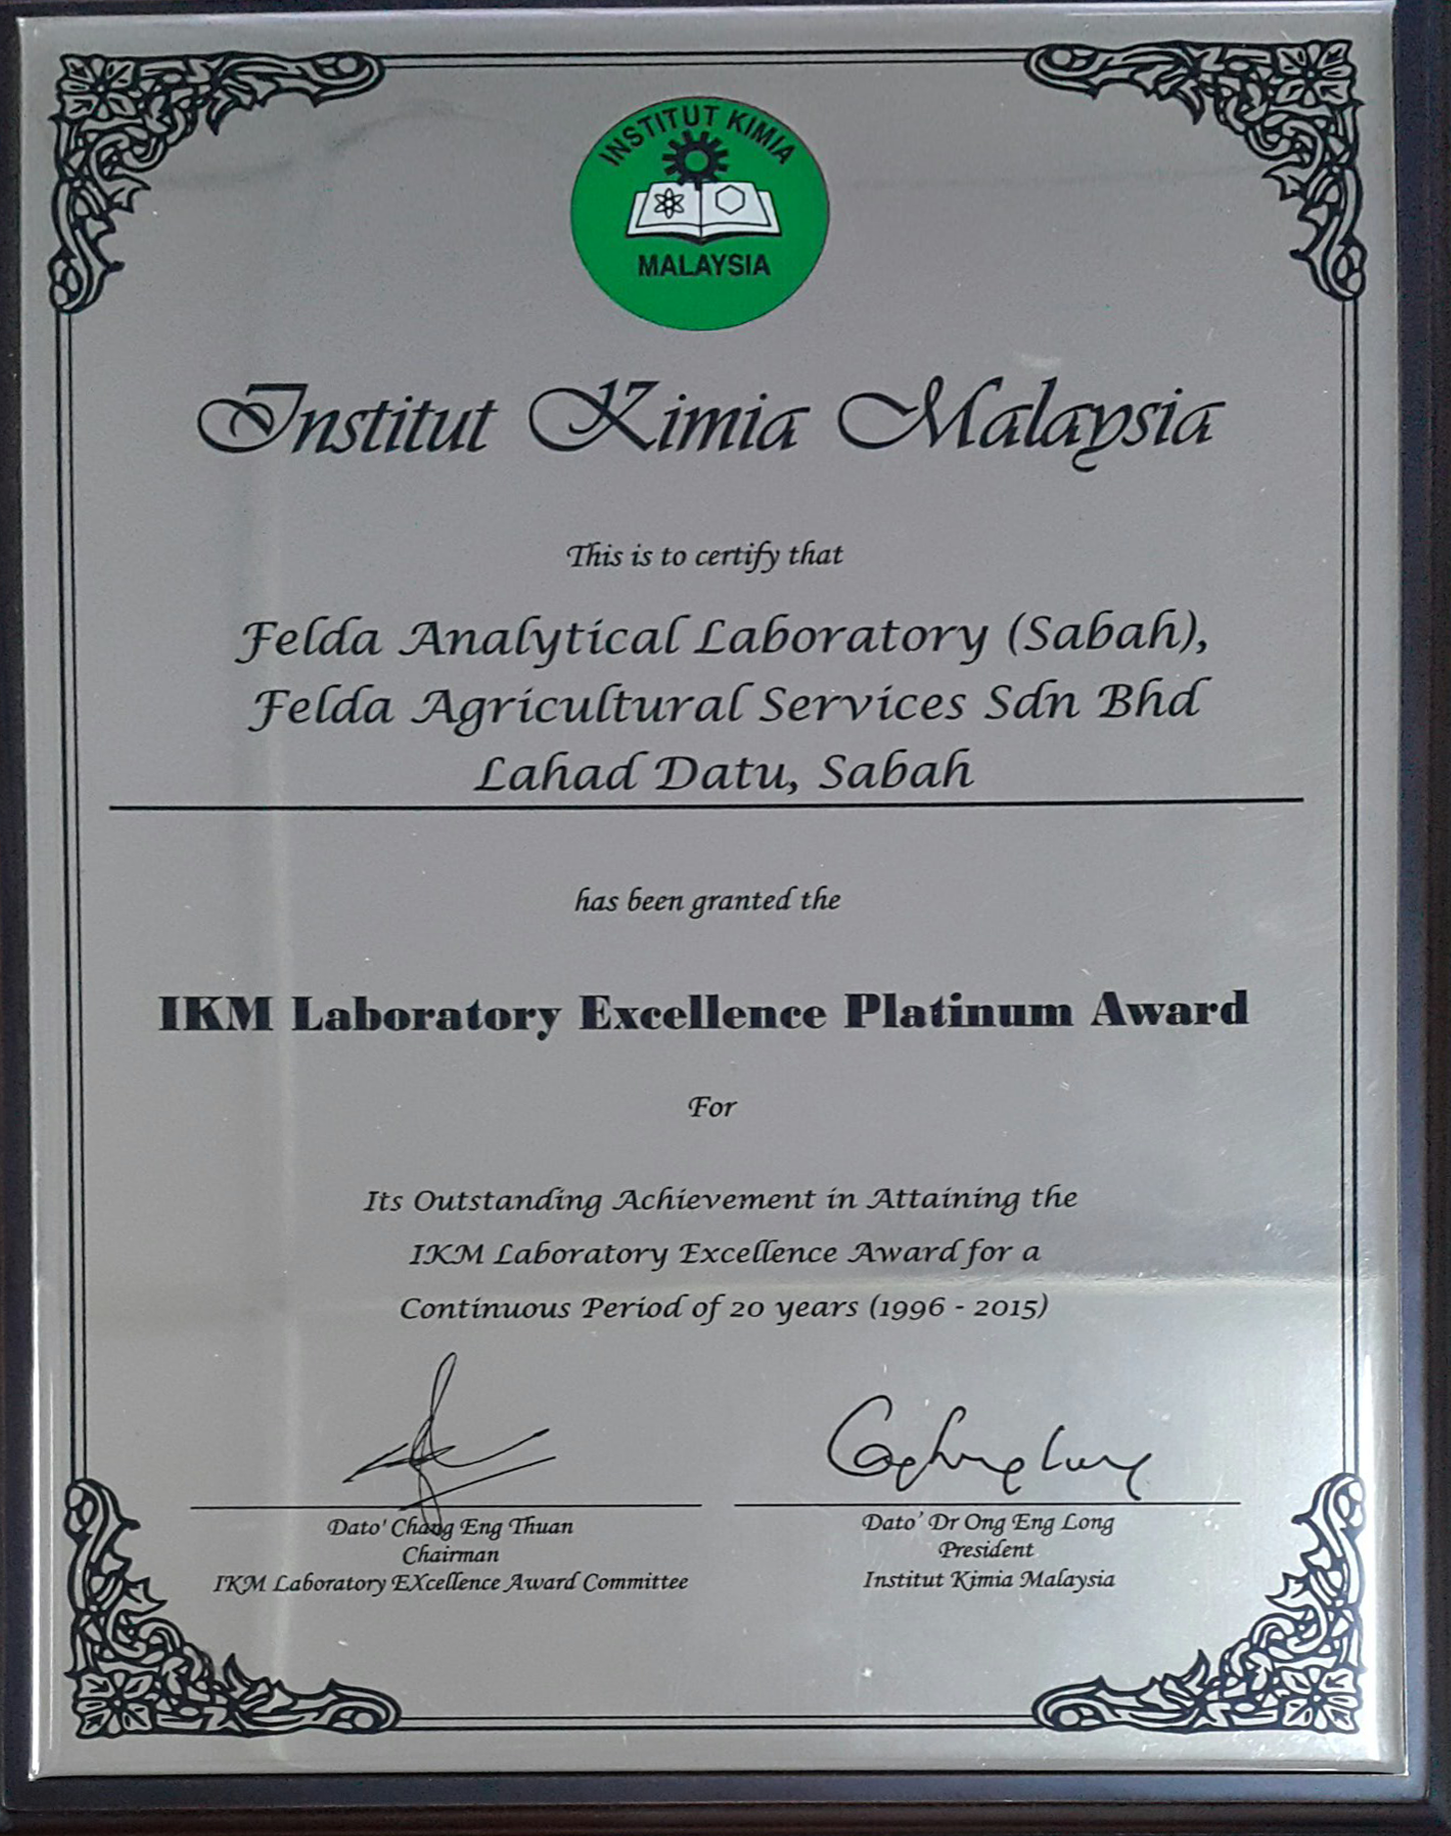 IKM Laboratory Excellent Platinum Awards (Lahad Datu)